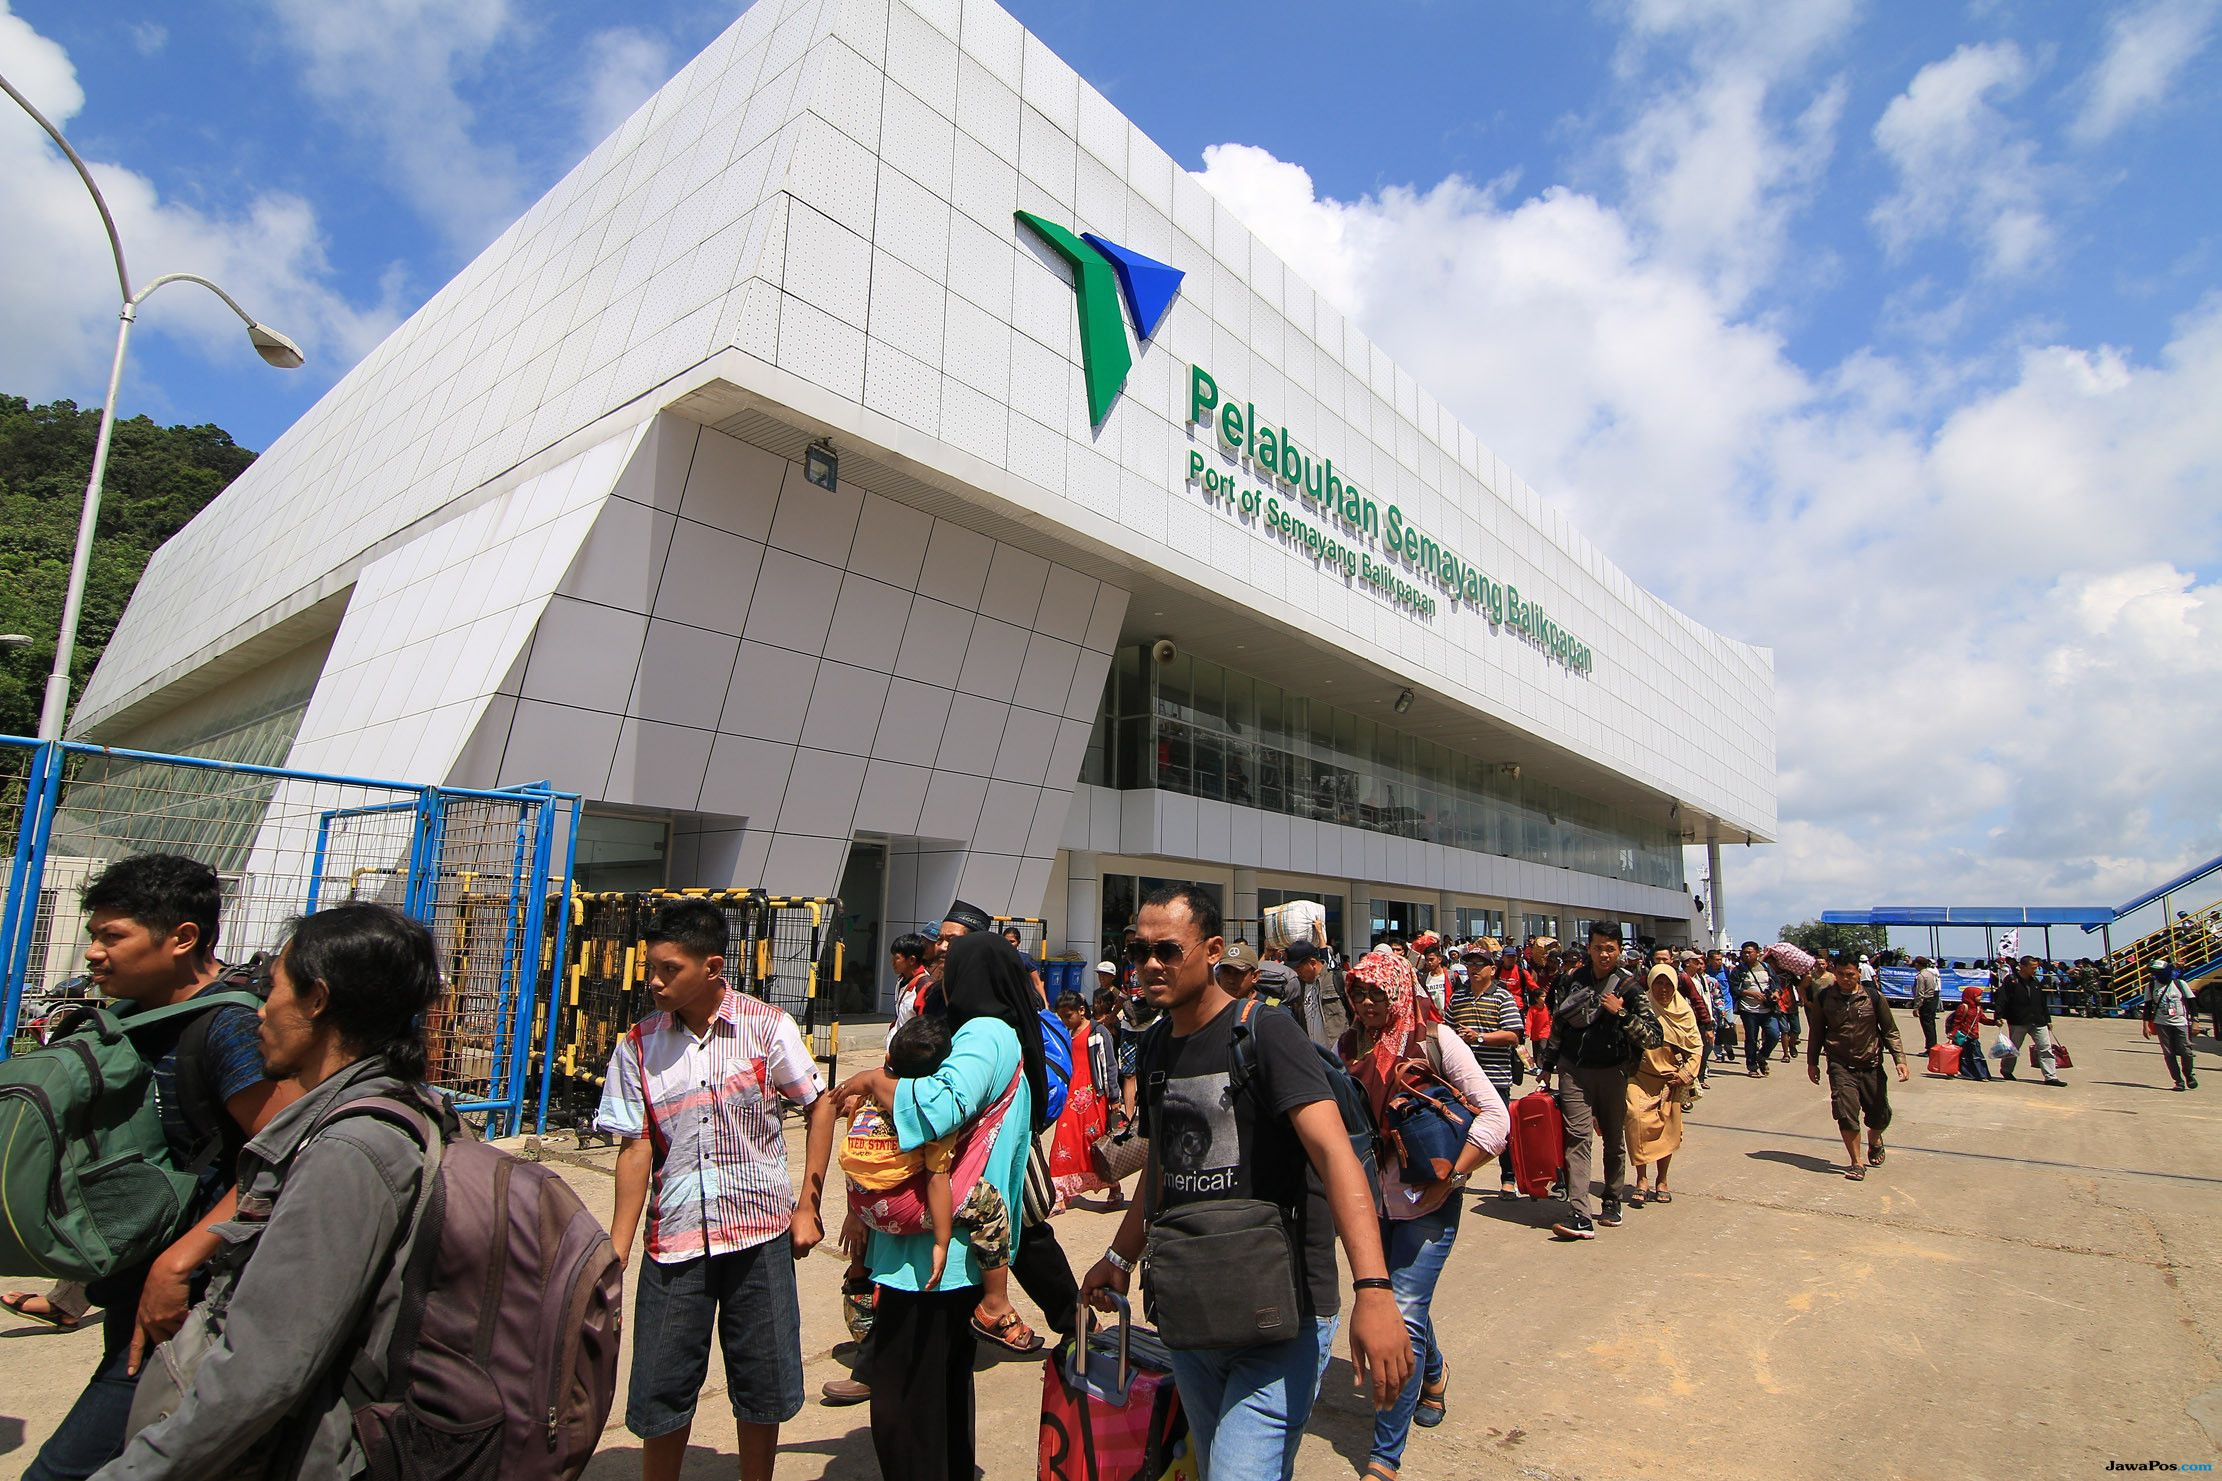 Antisipasi Penurunan Penumpang, Pelindo IV Siapkan Tiket Gratis